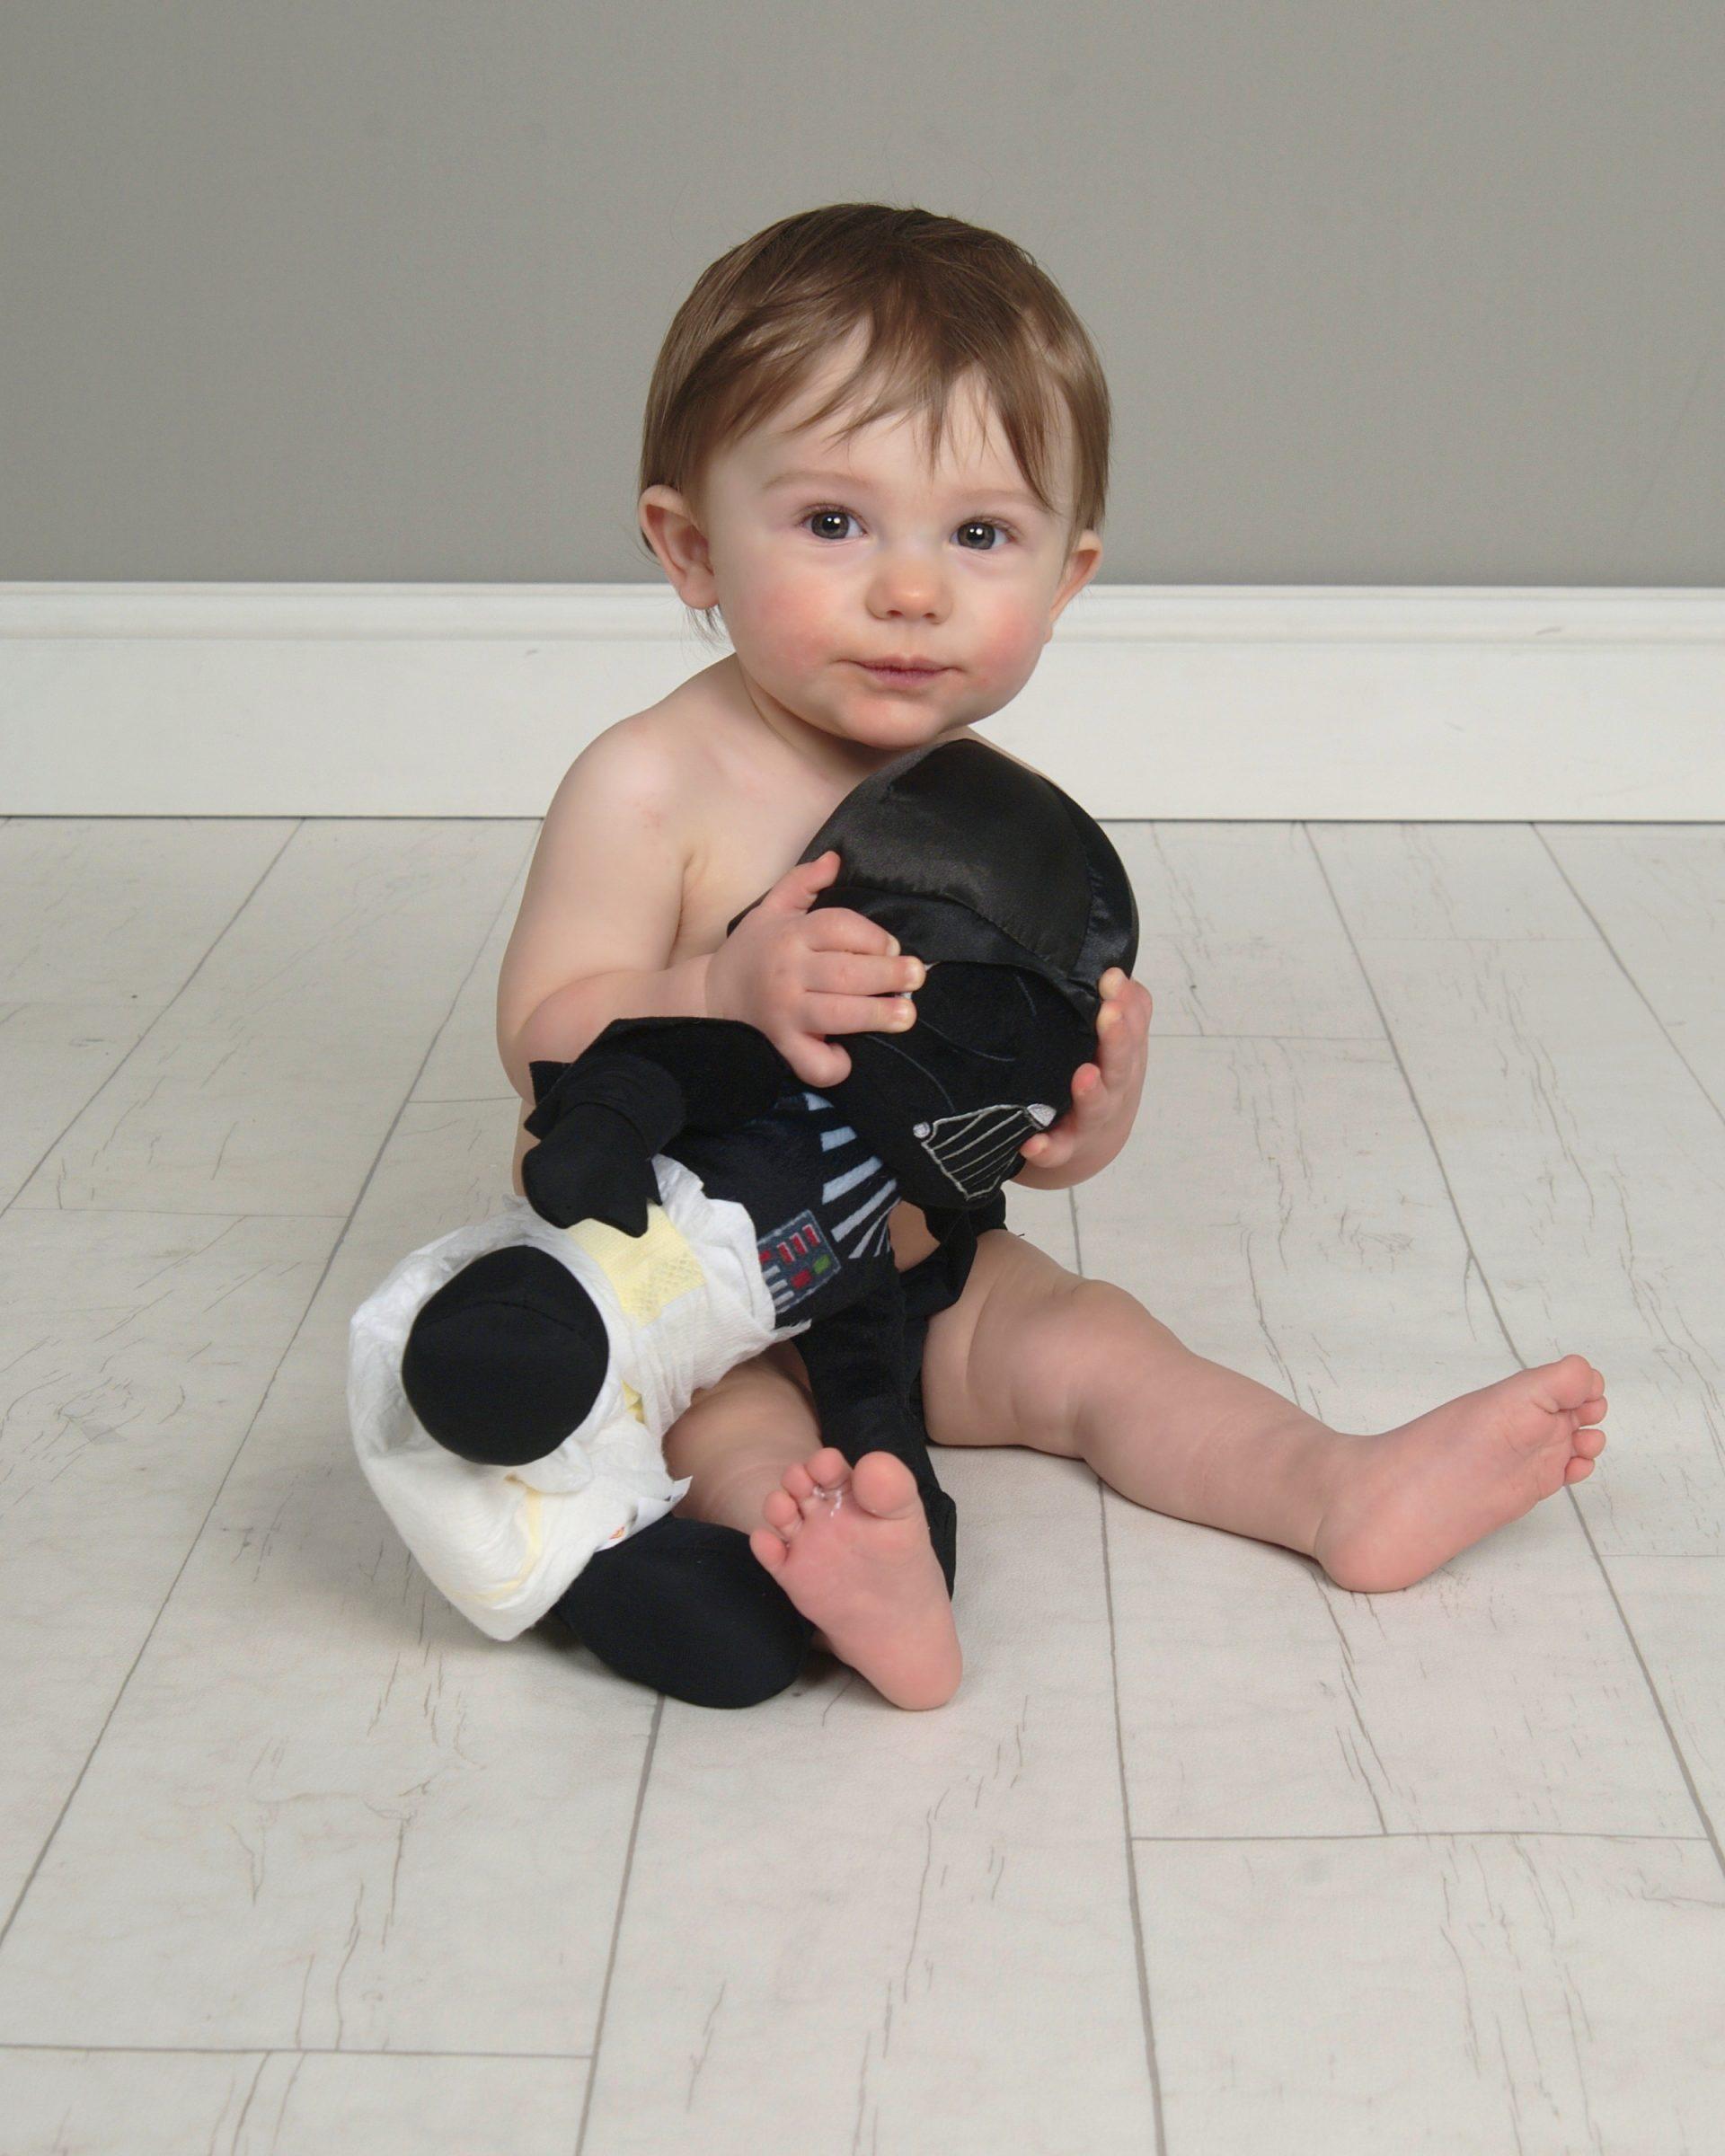 Darth Vader in Diaper